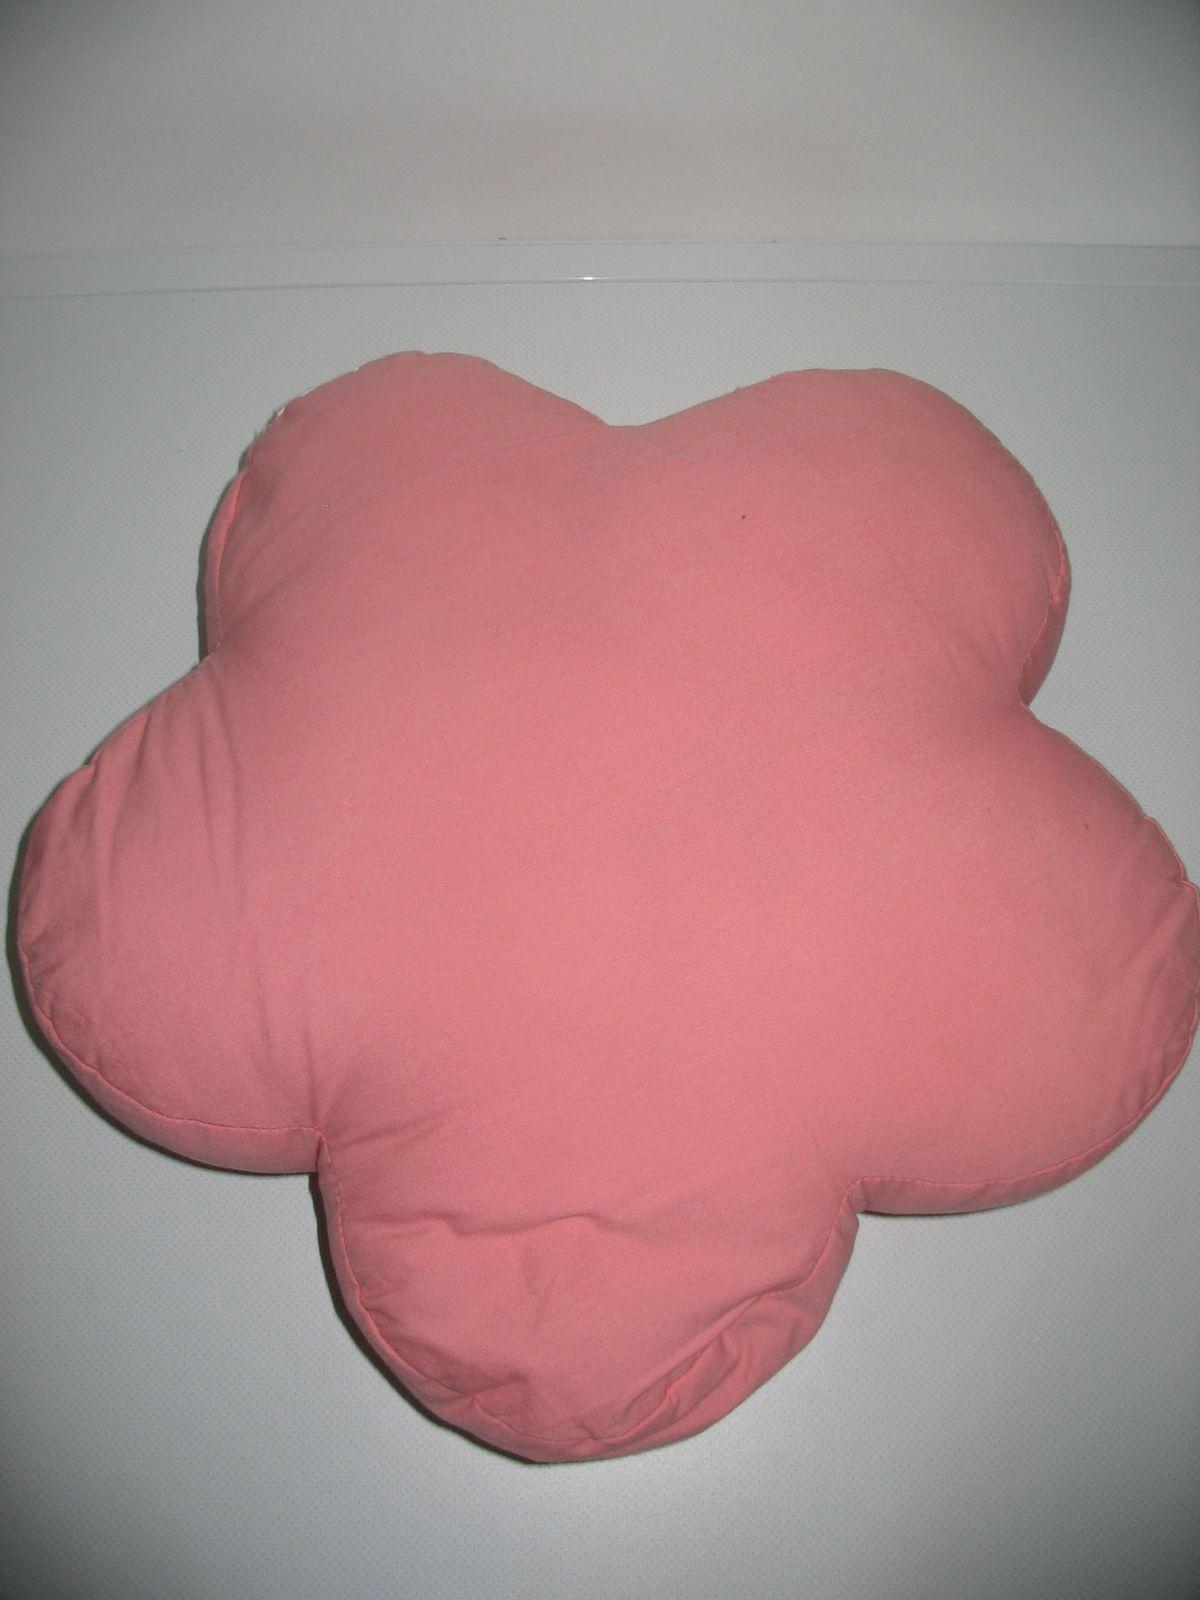 ... Virág formájú rózsaszín-bordó kétoldalú plüss párna 05c742c181